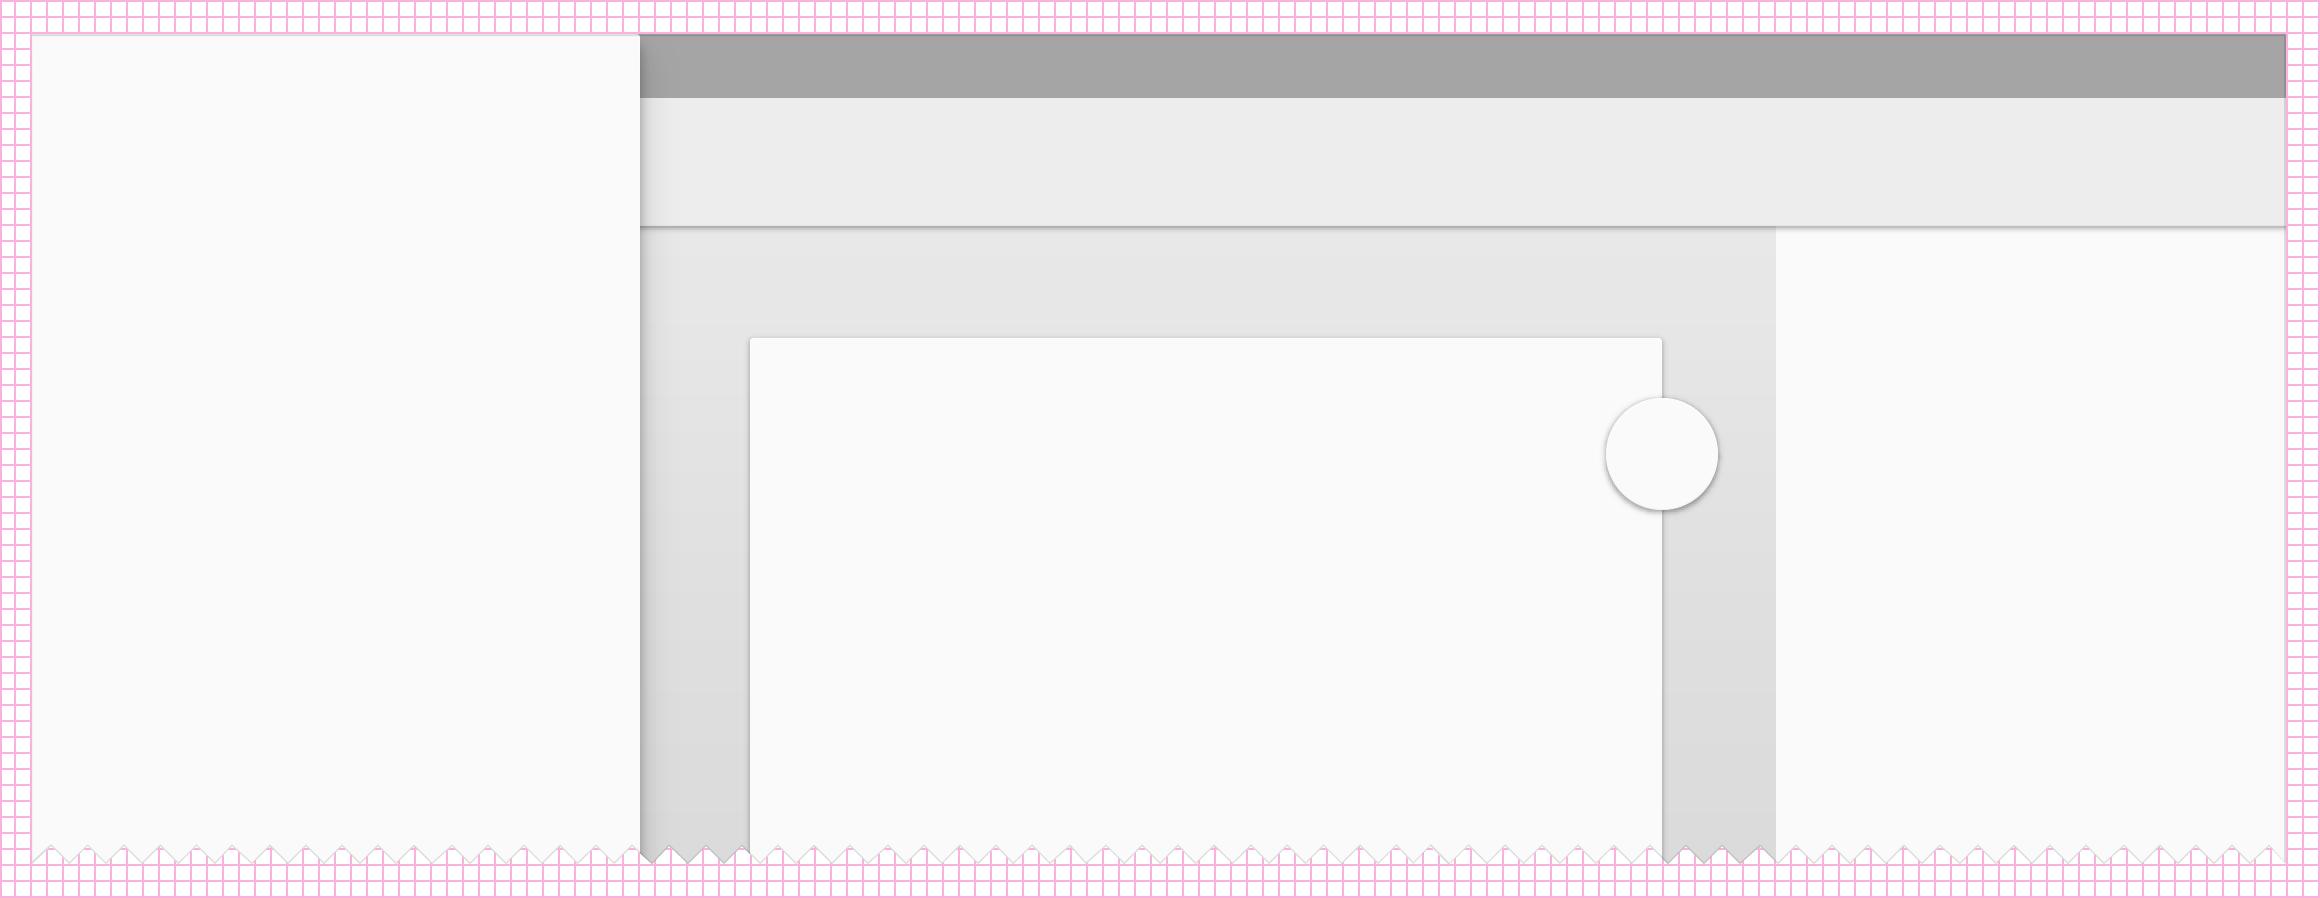 layout_metrics_baseline4.png